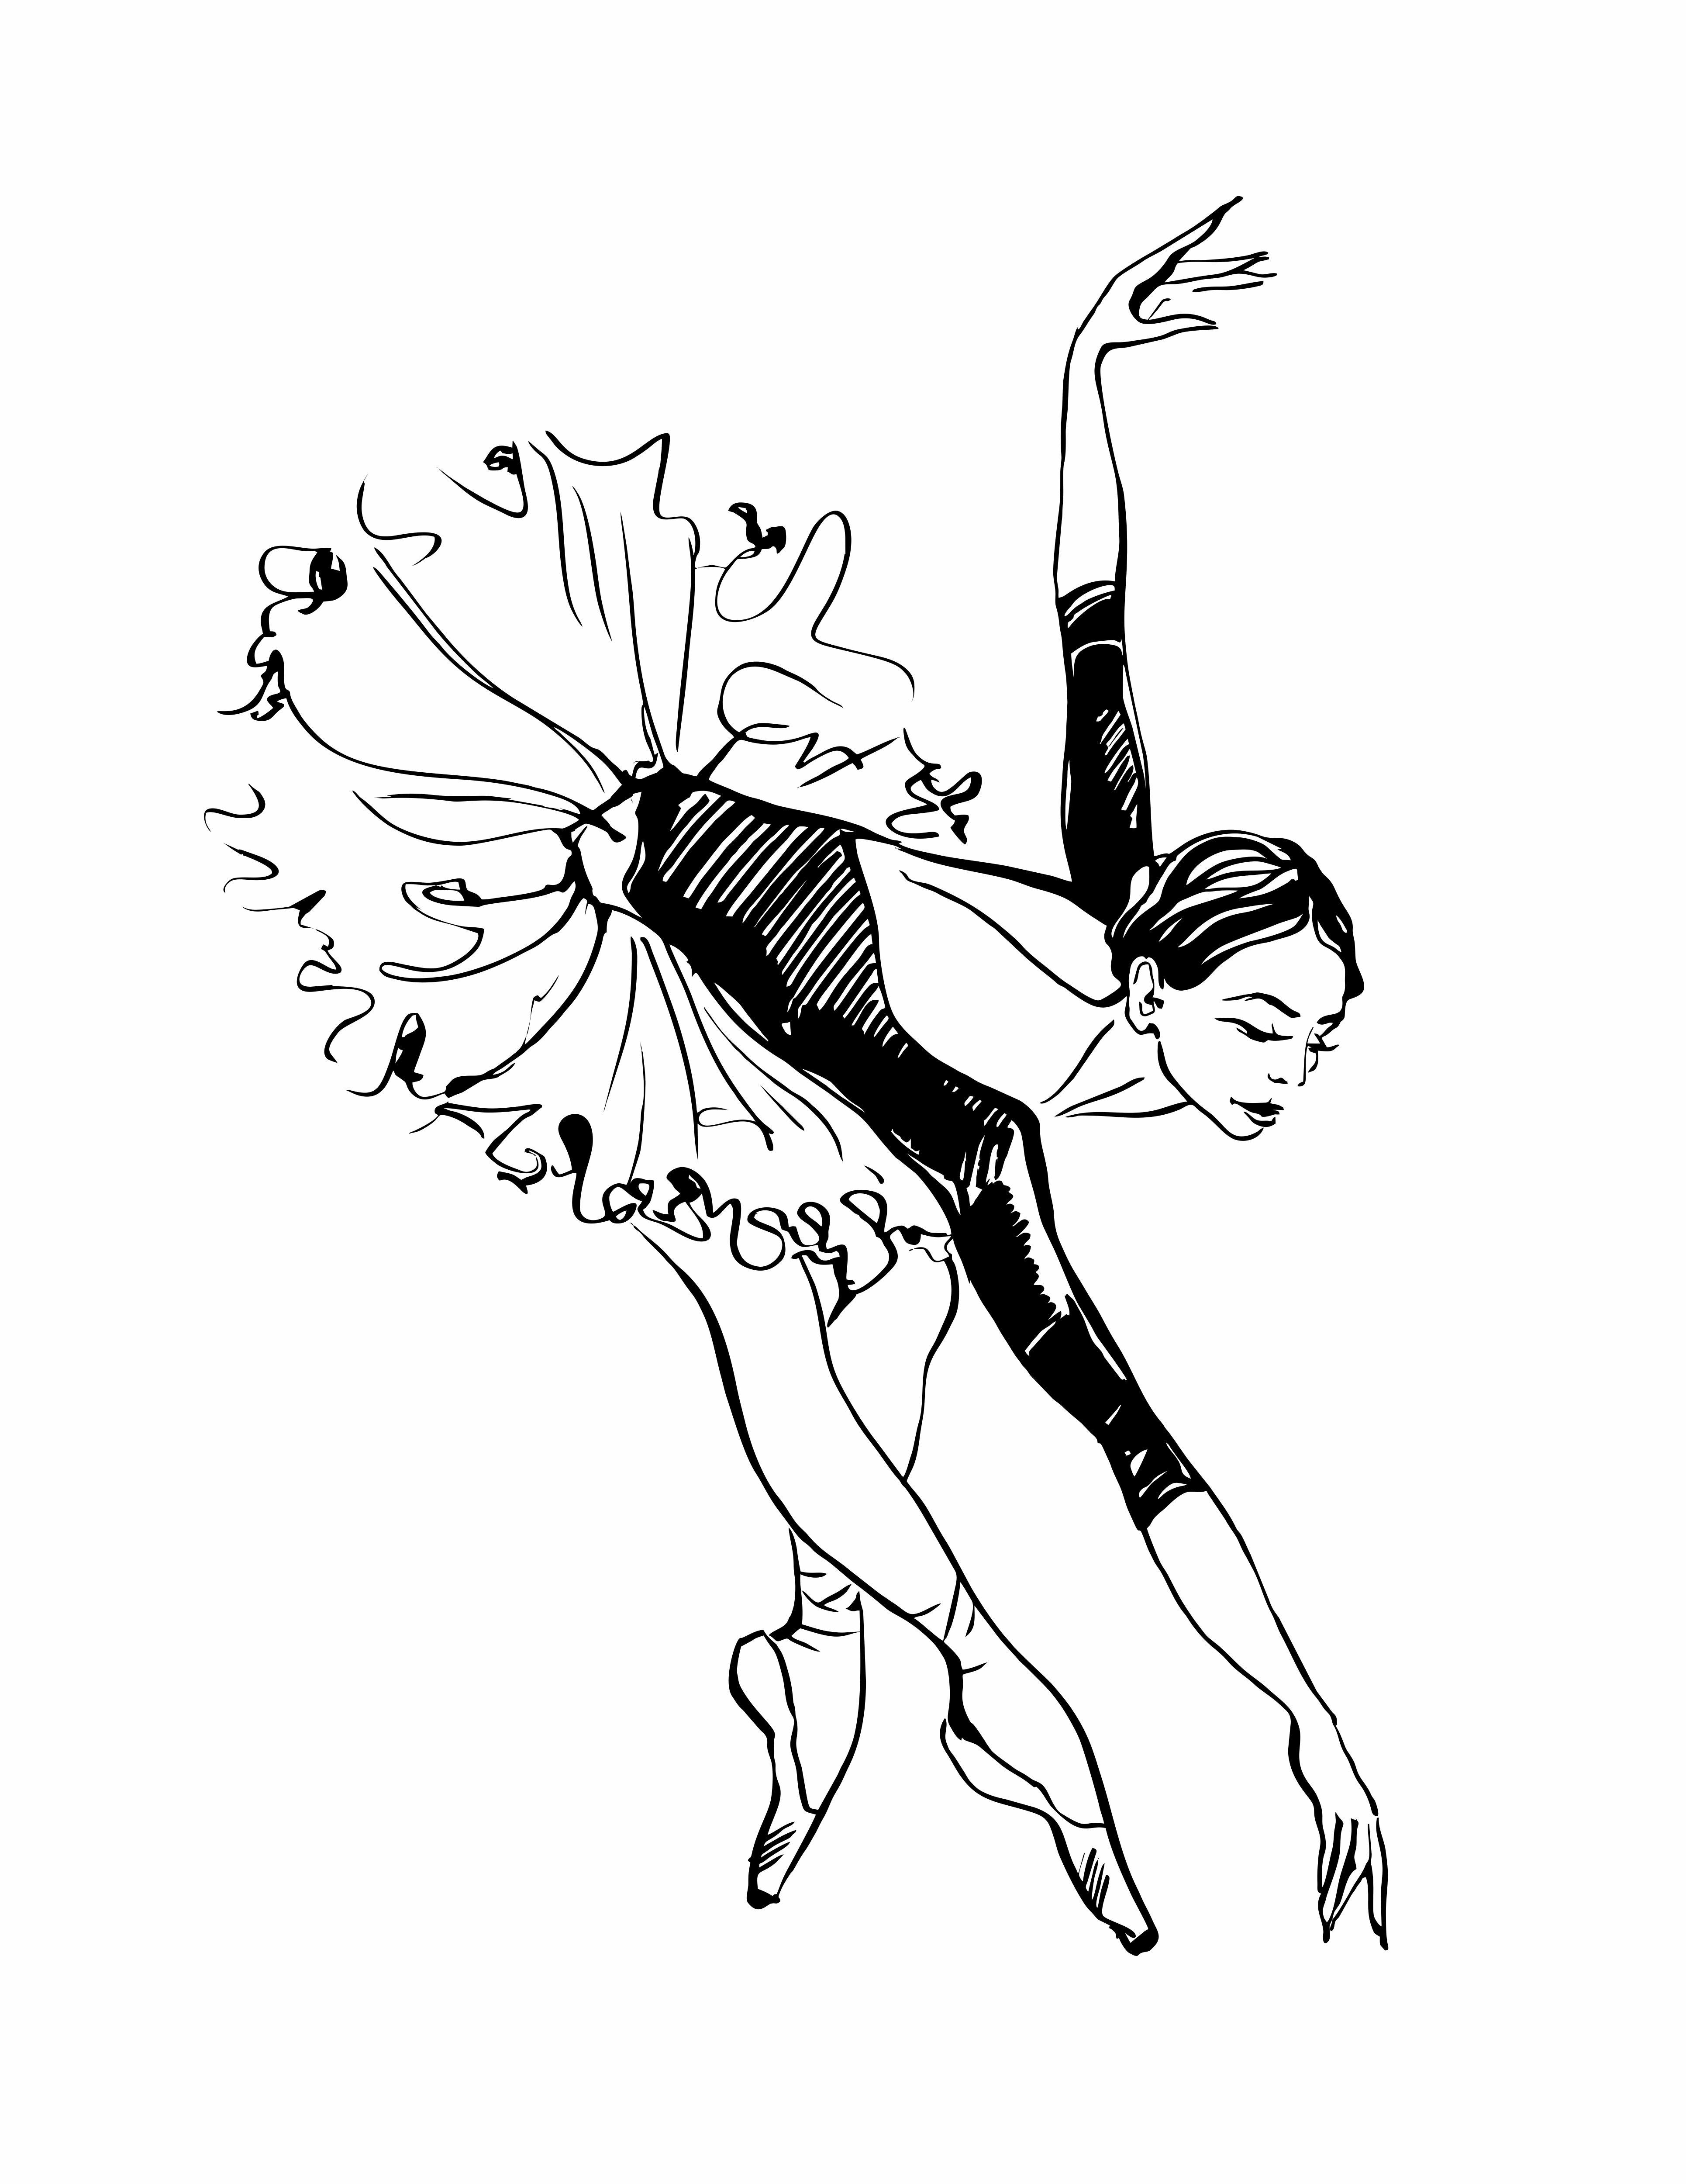 Bailarina Menina Dancando Desenho Preto E Branco Bale Vetor